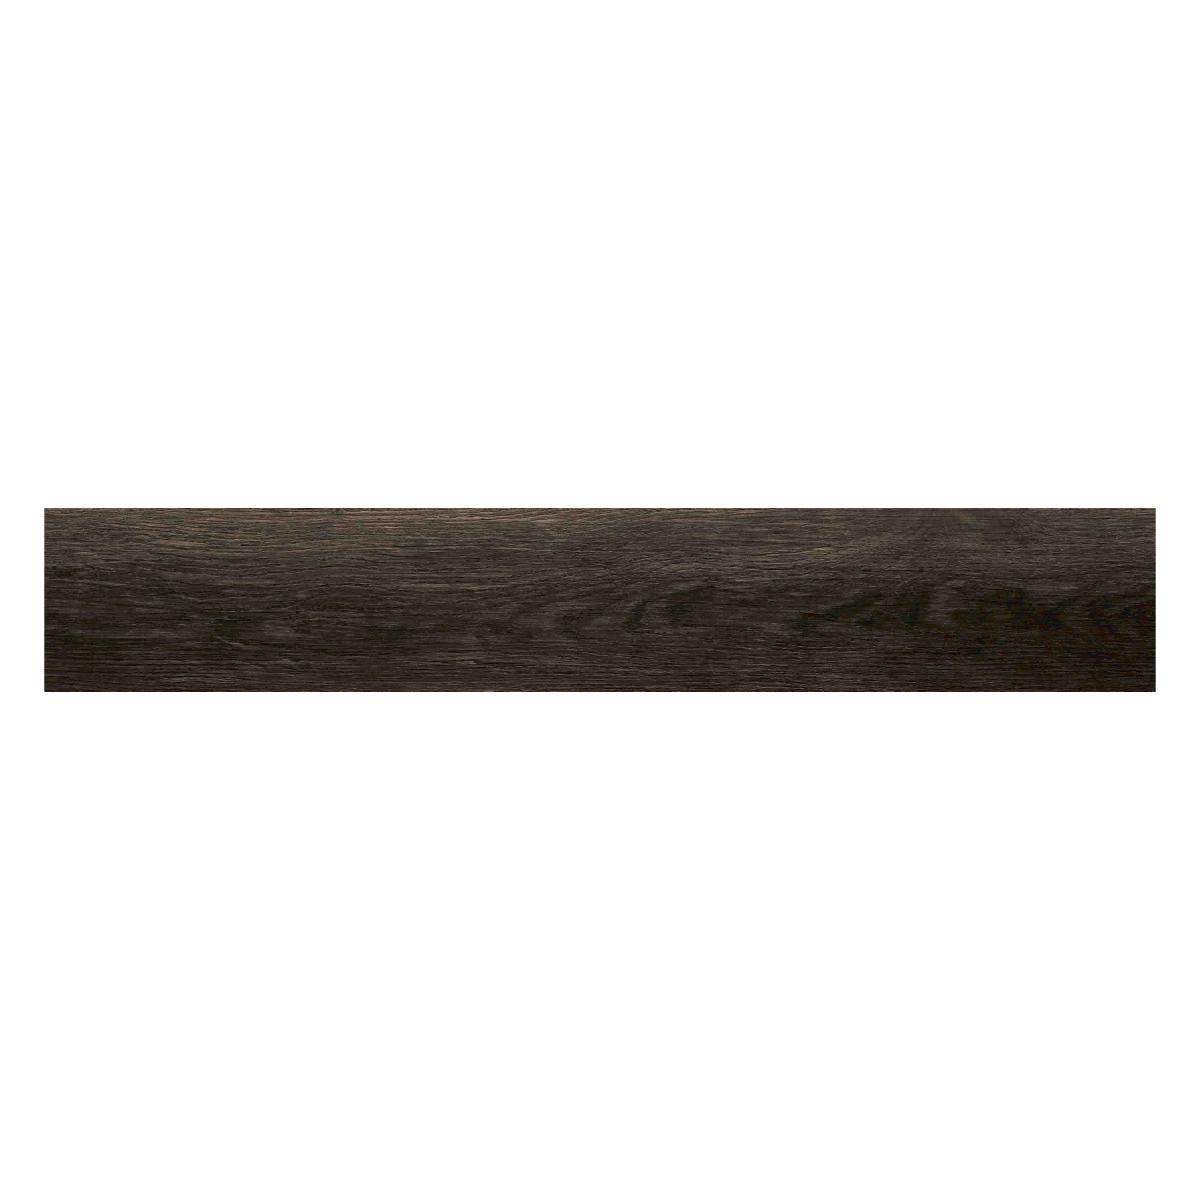 Piso PVC Manhattan Roble Bastille Mate - 18.4X12.2 - 2.24 m2